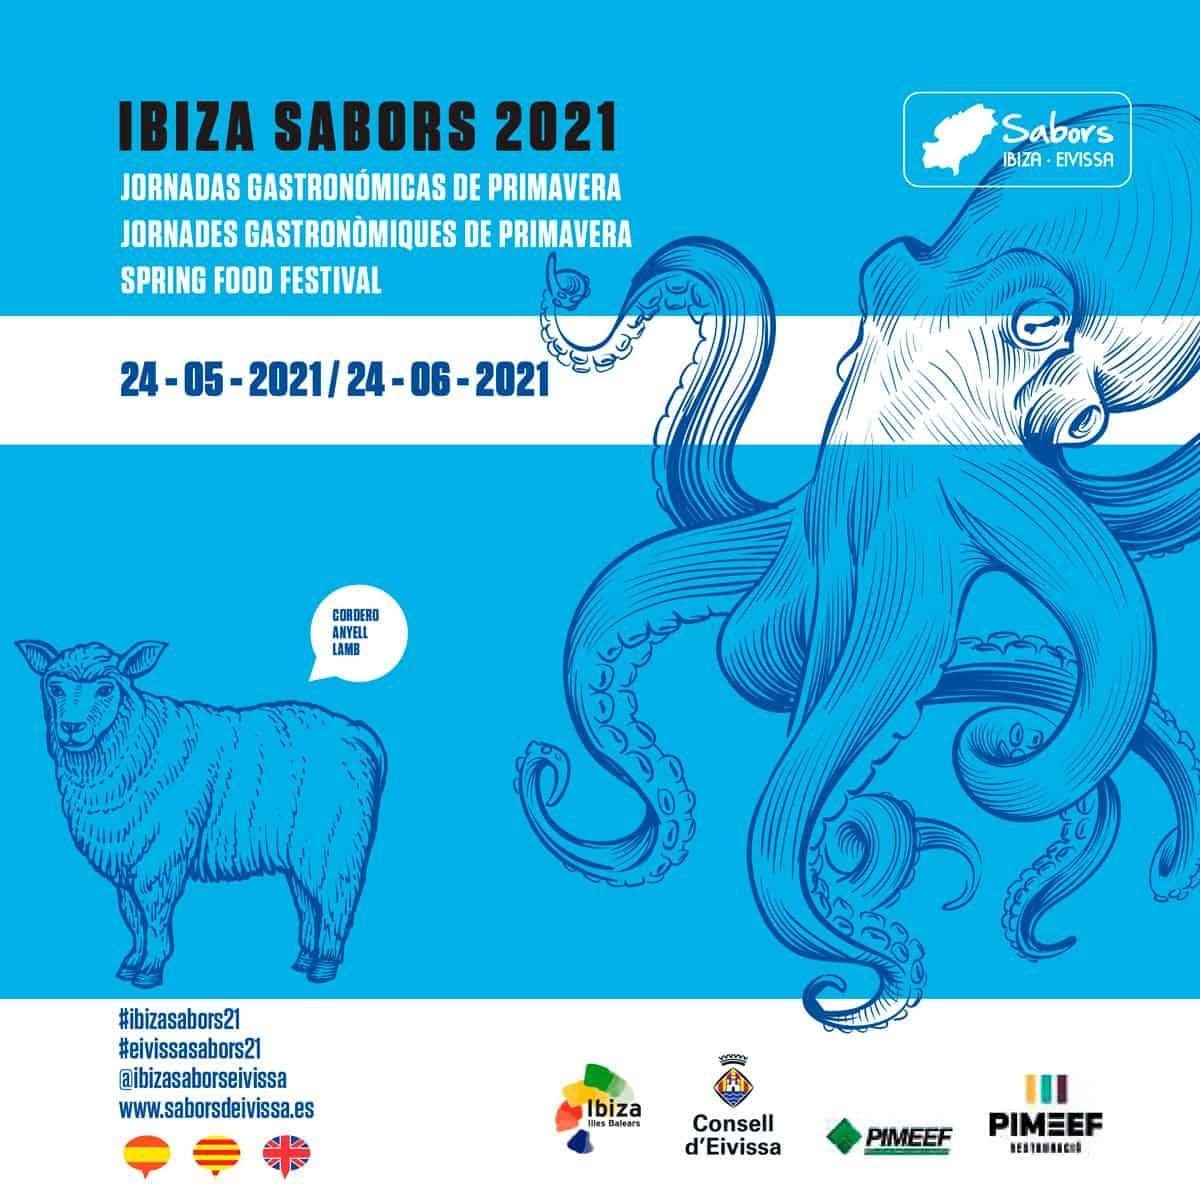 Eivissa-gust-jornades-gastronòmiques-primavera-2021-welcometoibiza